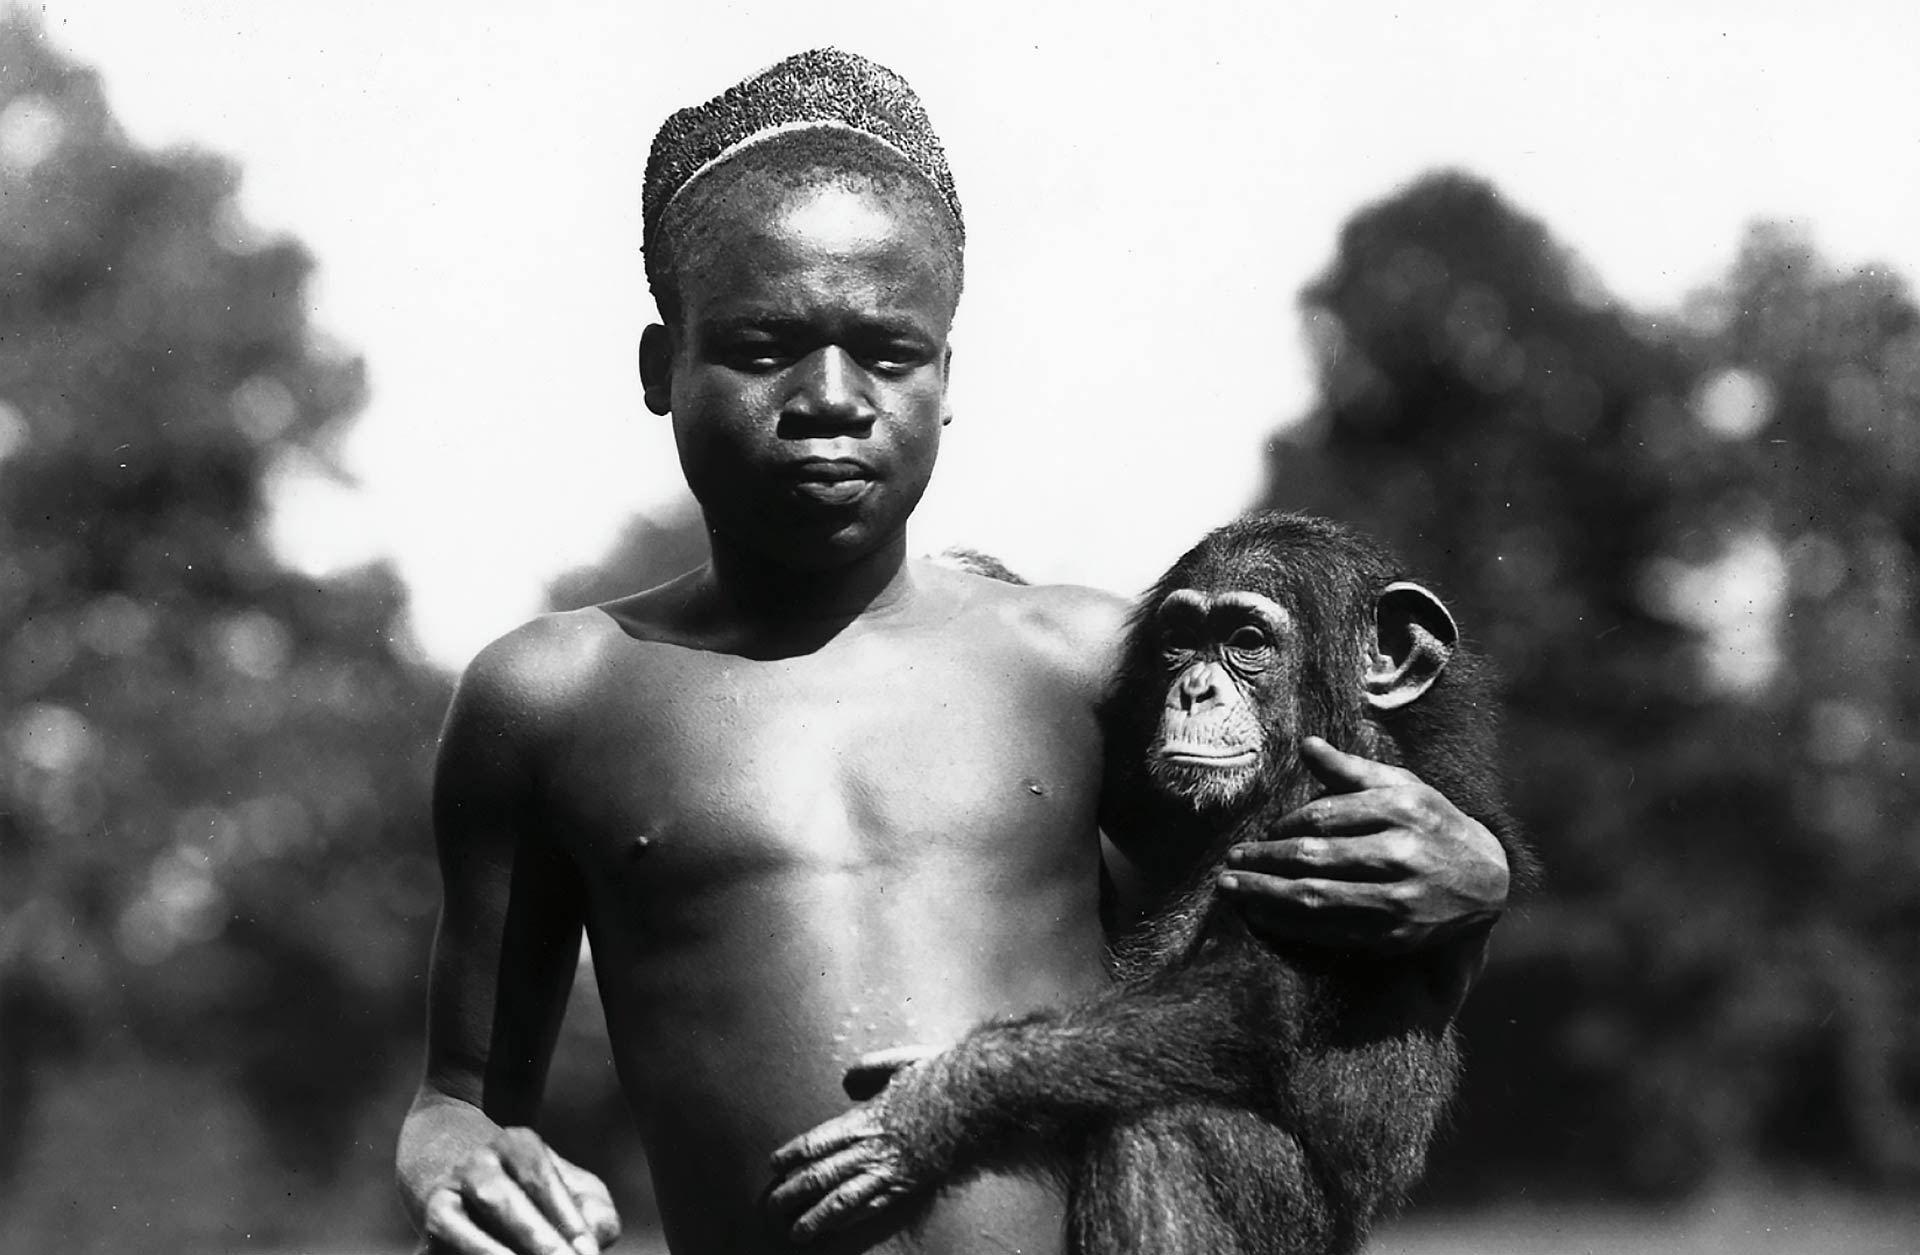 The furor over Ota Benga, an African man displayed with